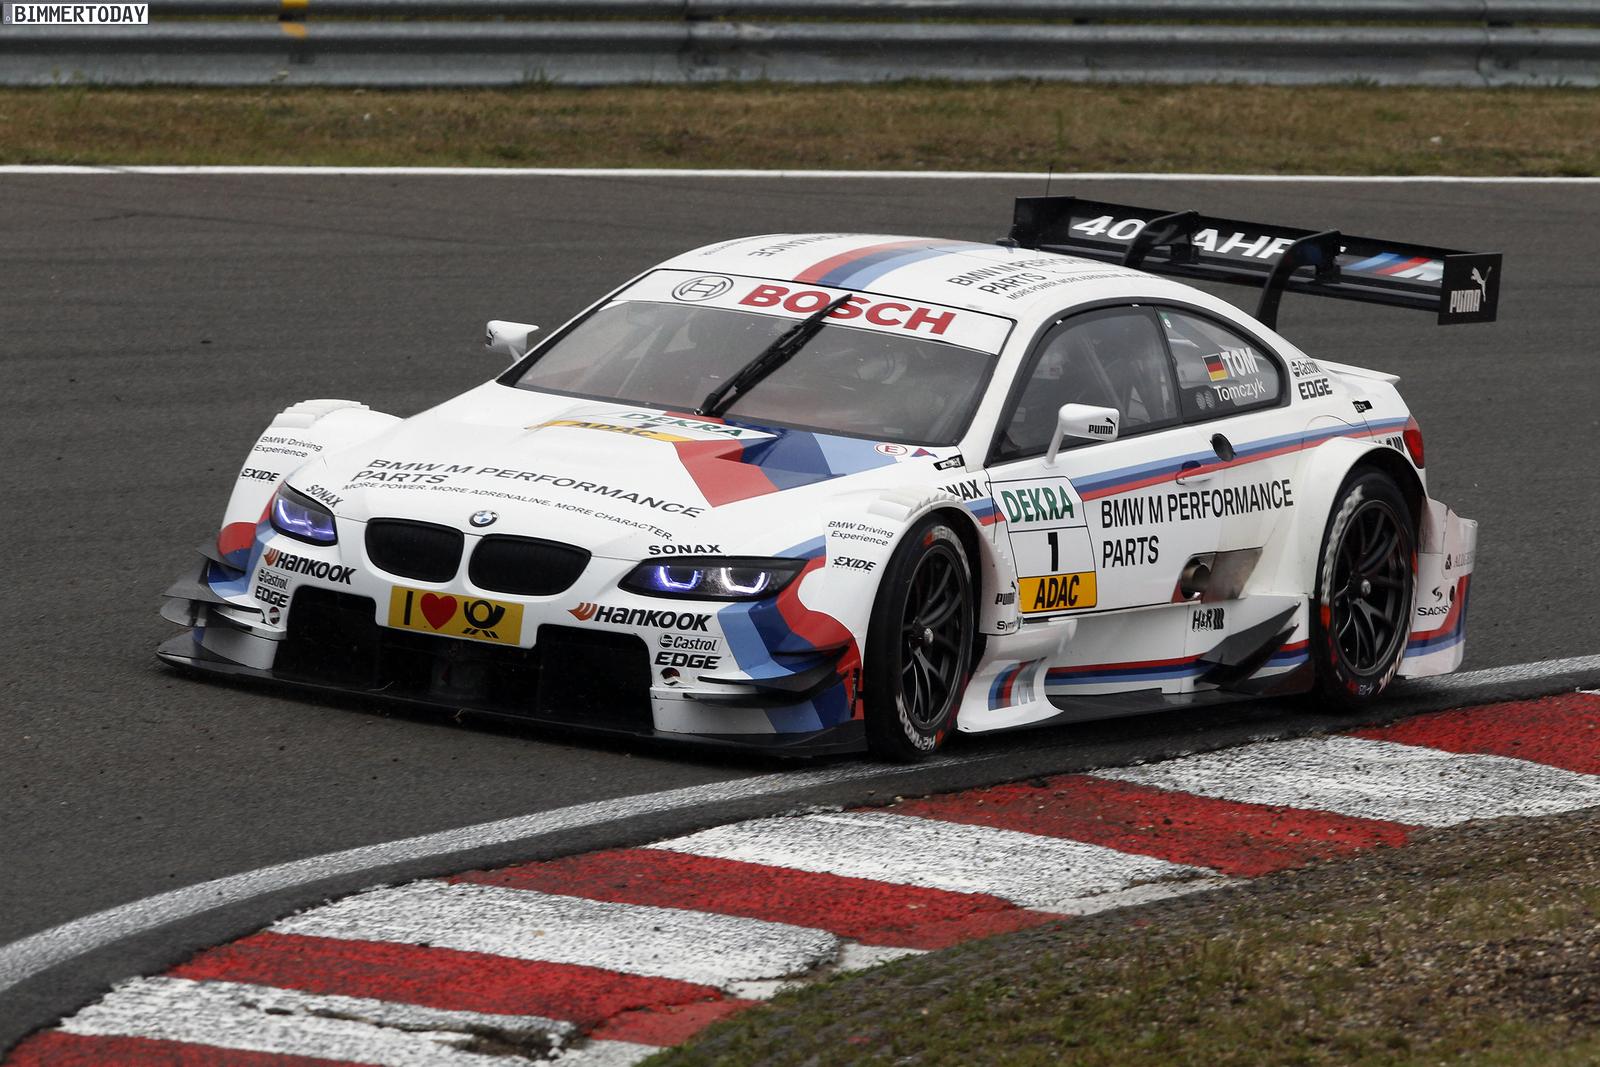 BMW-Motorsport-DTM-2012-Zandvoort-M3-DTM-09